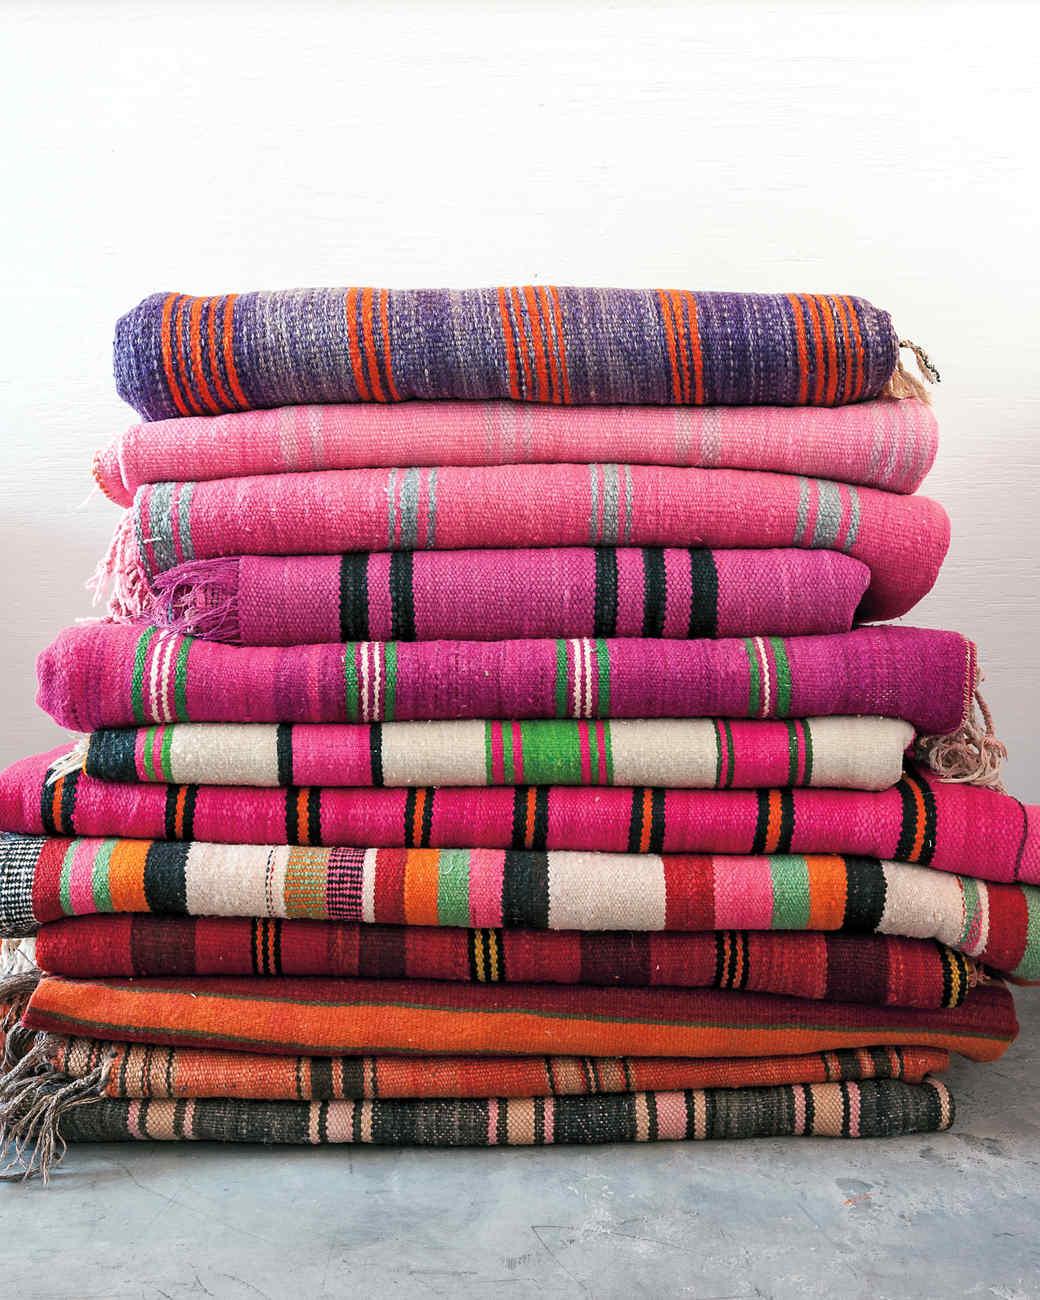 blankets0006041-md110535.jpg